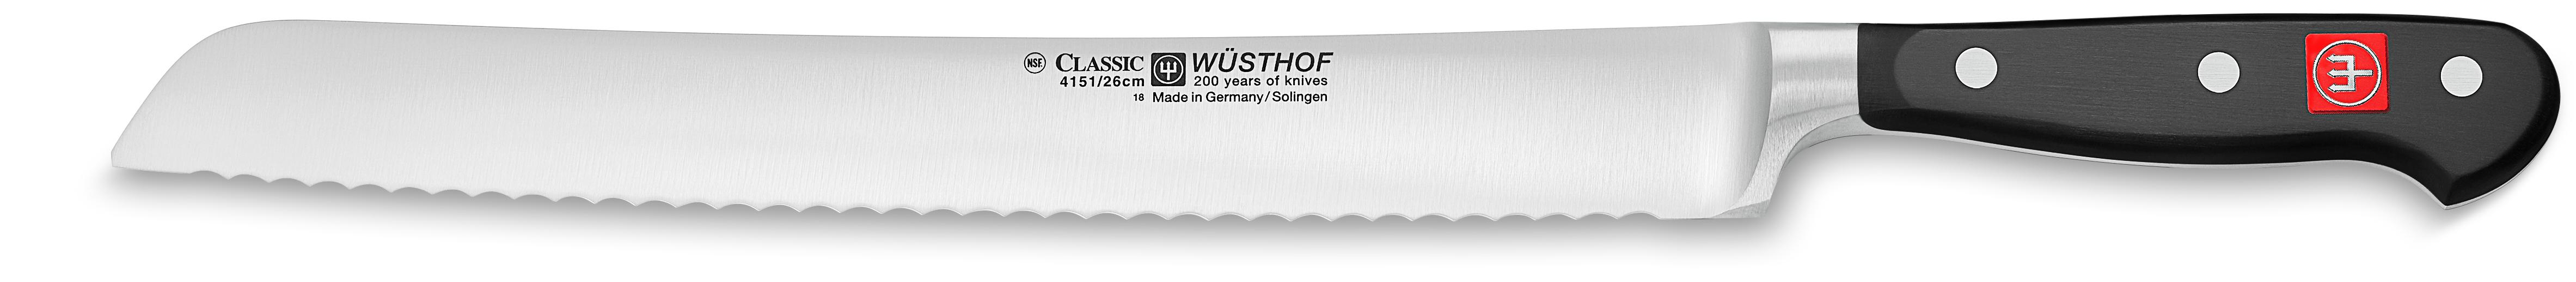 Wüsthof Brotmesser 4151